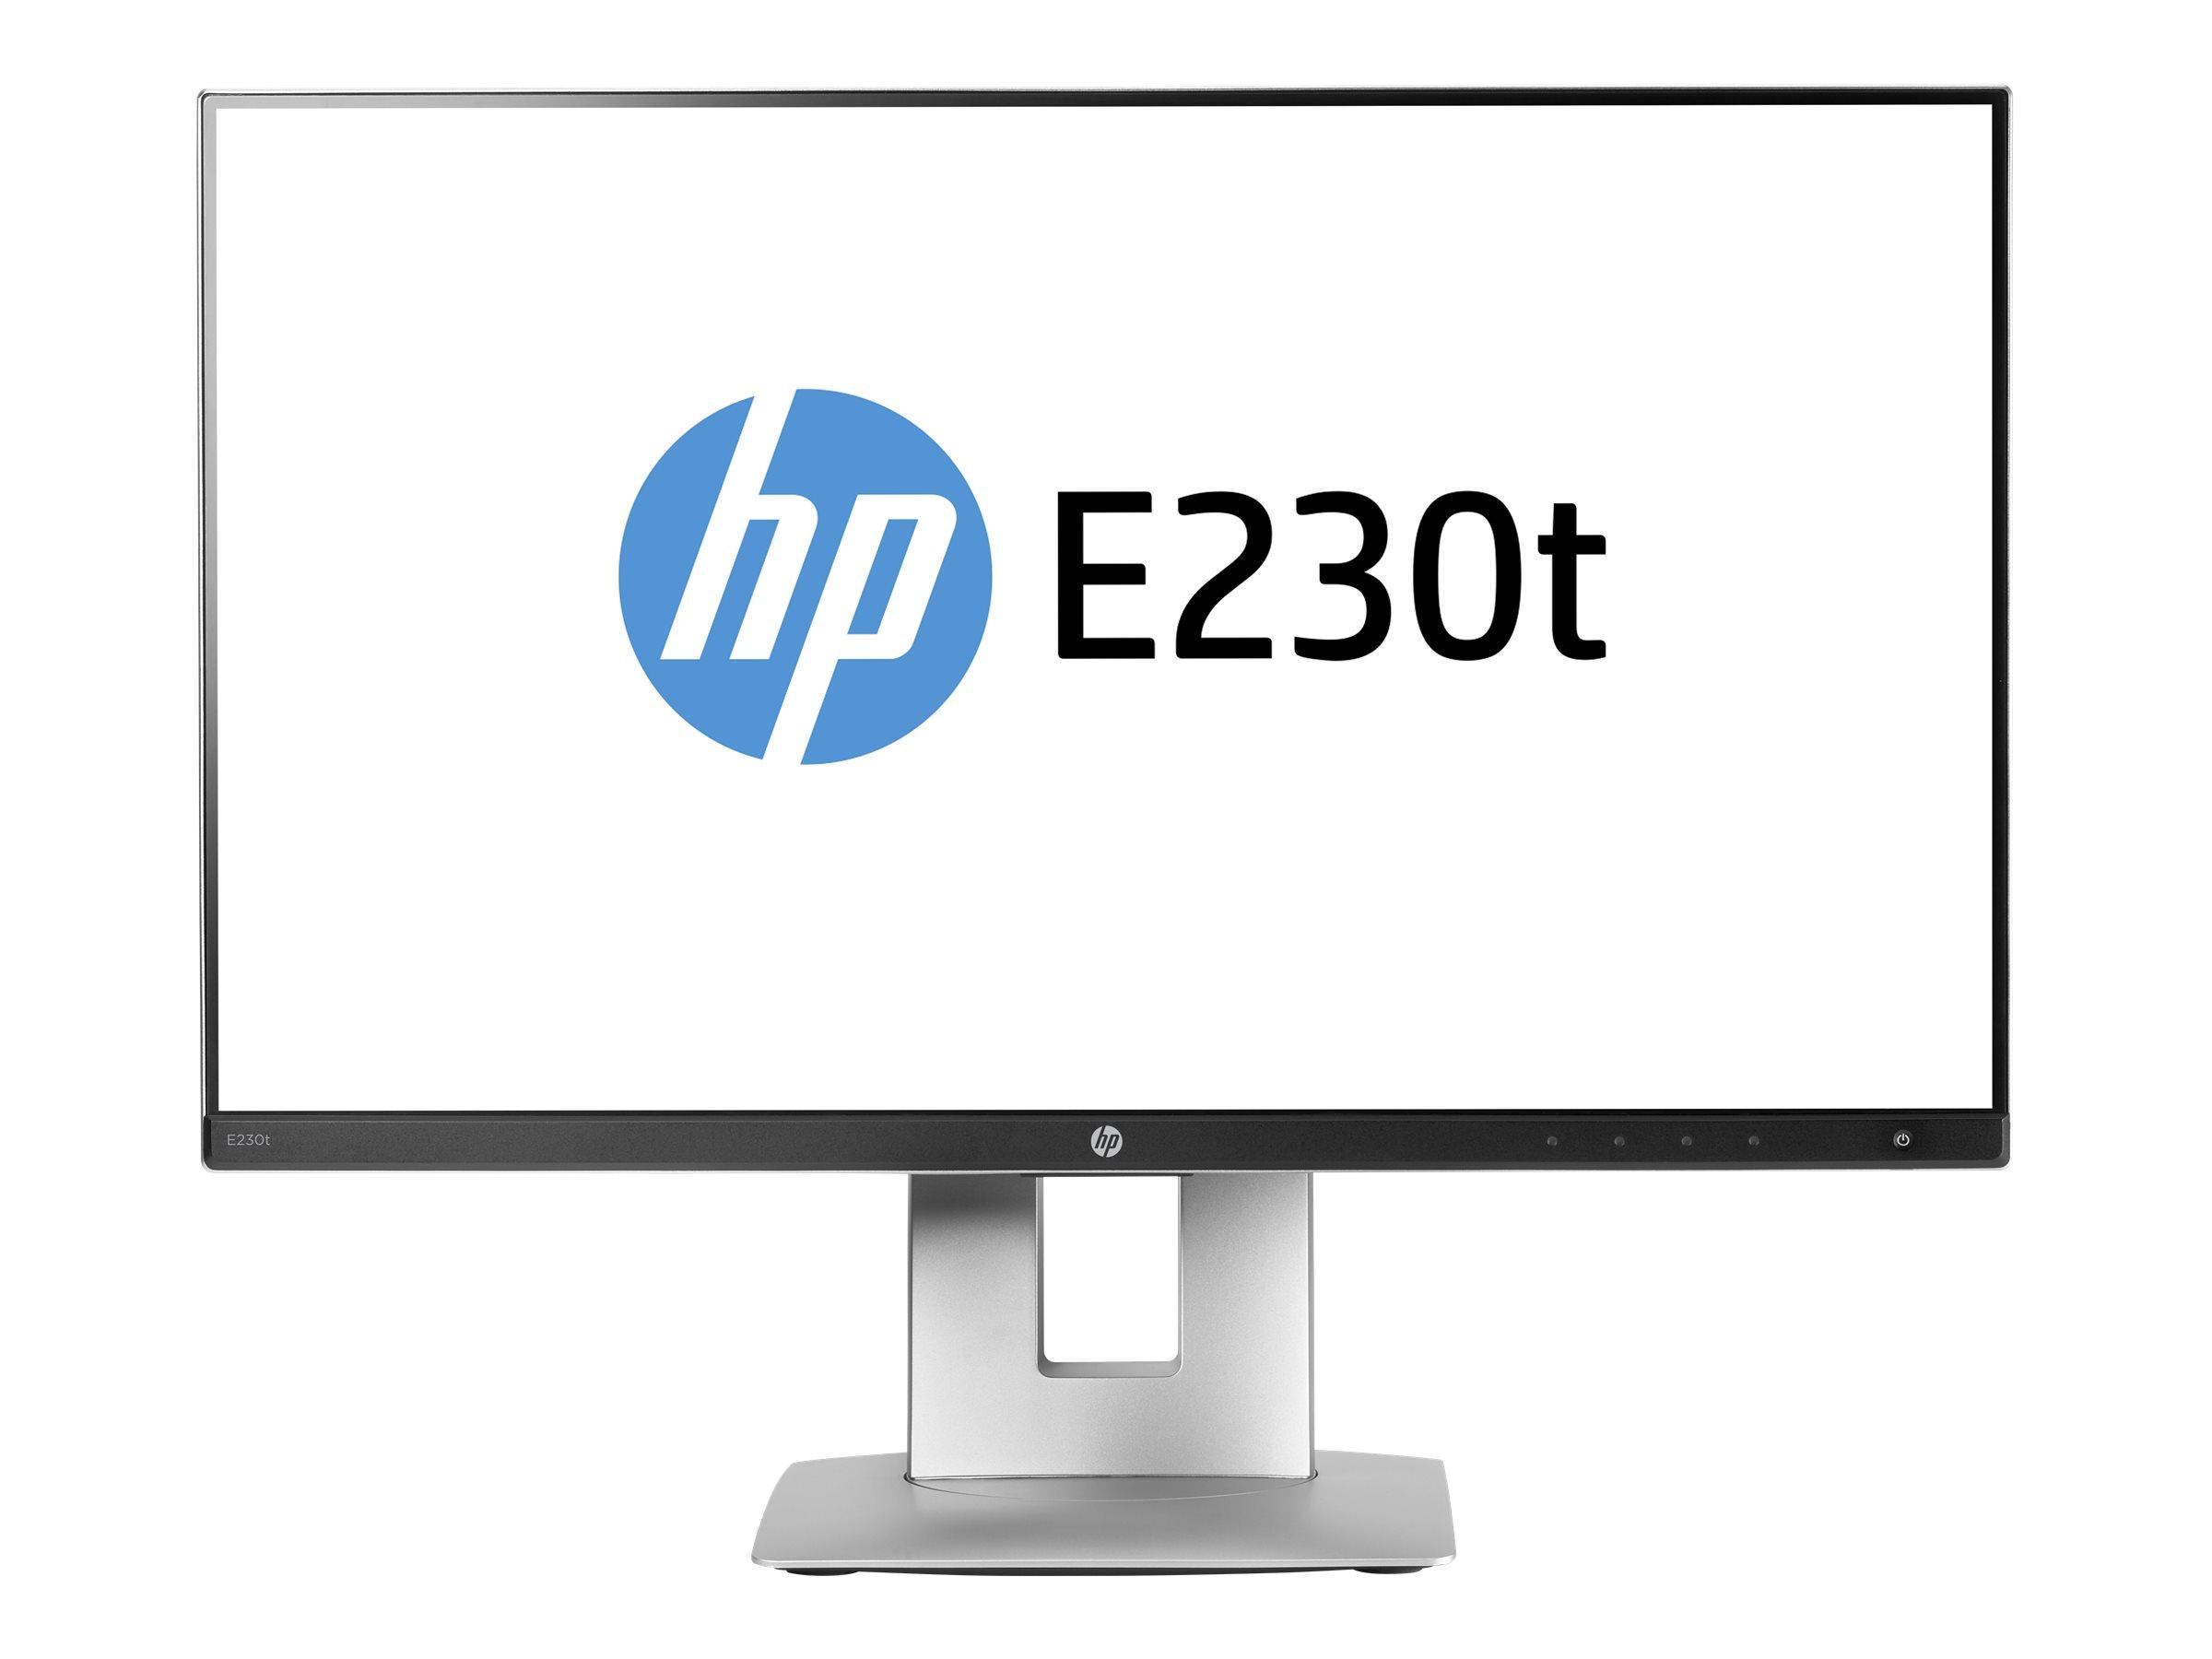 HP EliteDisplay E230t - LED-Monitor - 58.42 cm (23